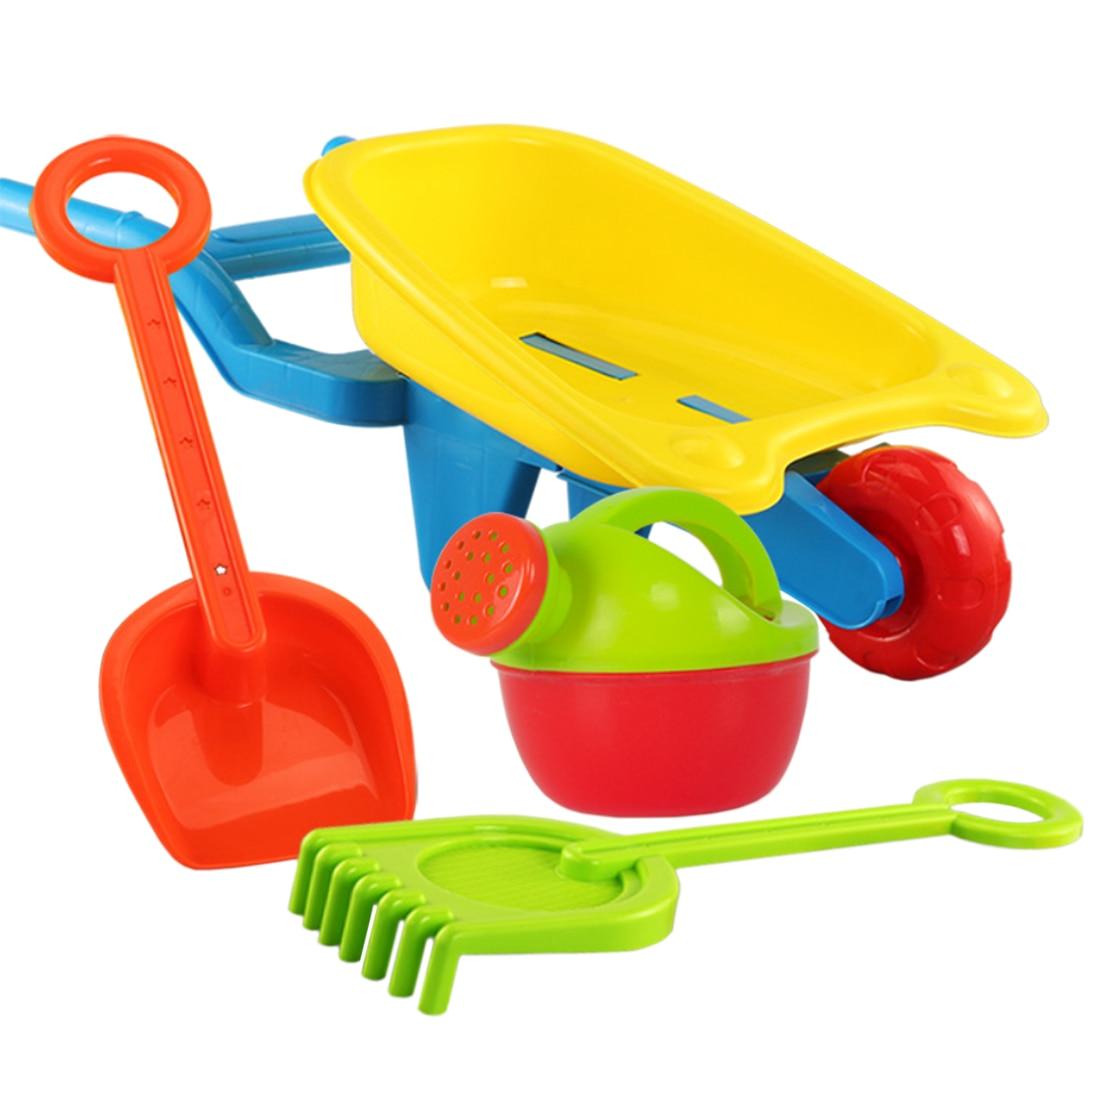 4Pcs Children Pretend Play Beach Sand Toy Set With Trolley Watering Can Shovel Rake Water Fun For Children Kids - Wheelbarrow L